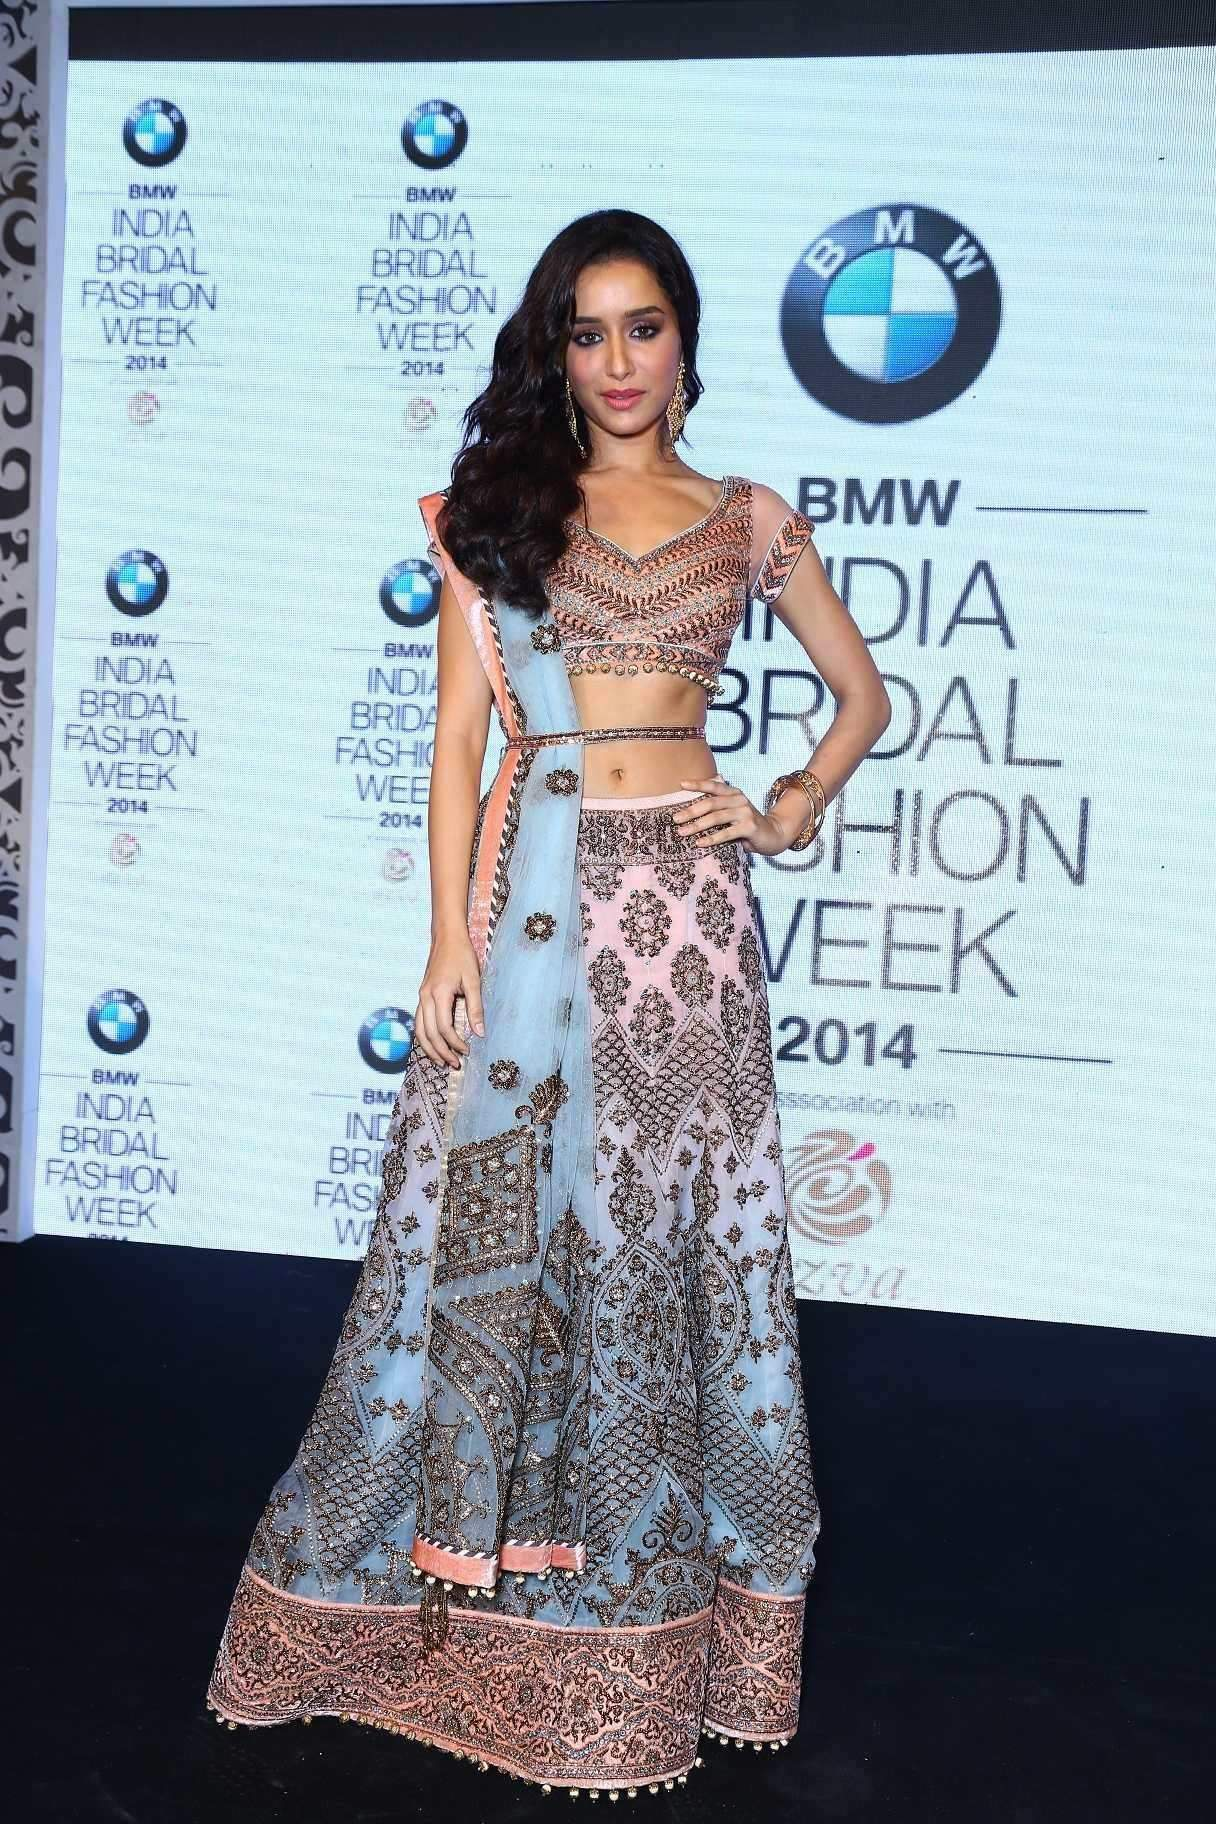 Shradhha Kapoor in a stunning JJ Valaya creation.